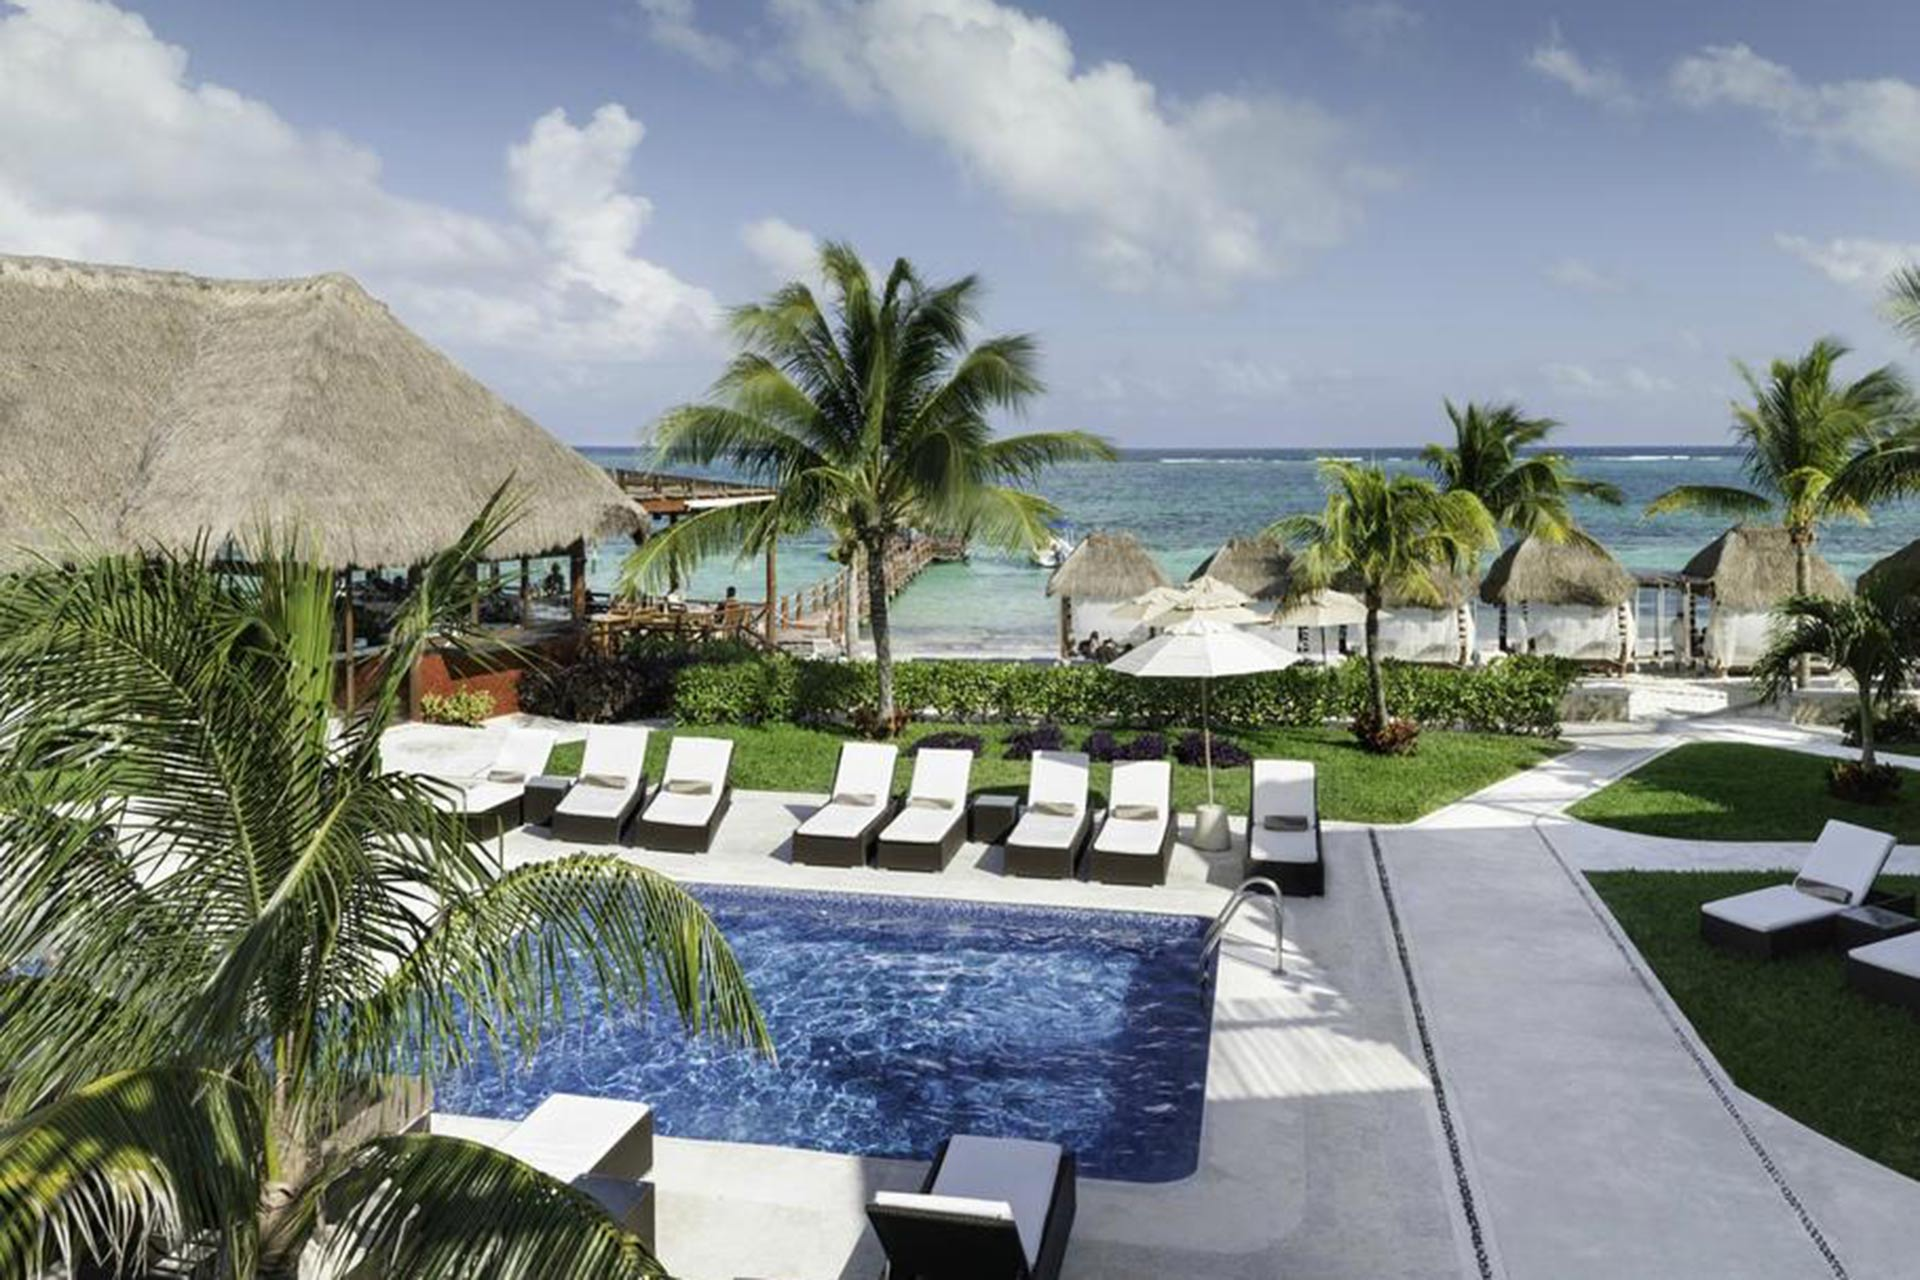 AZUL Beach Resort - Riviera Maya, Mexico - All Inclusive Resort